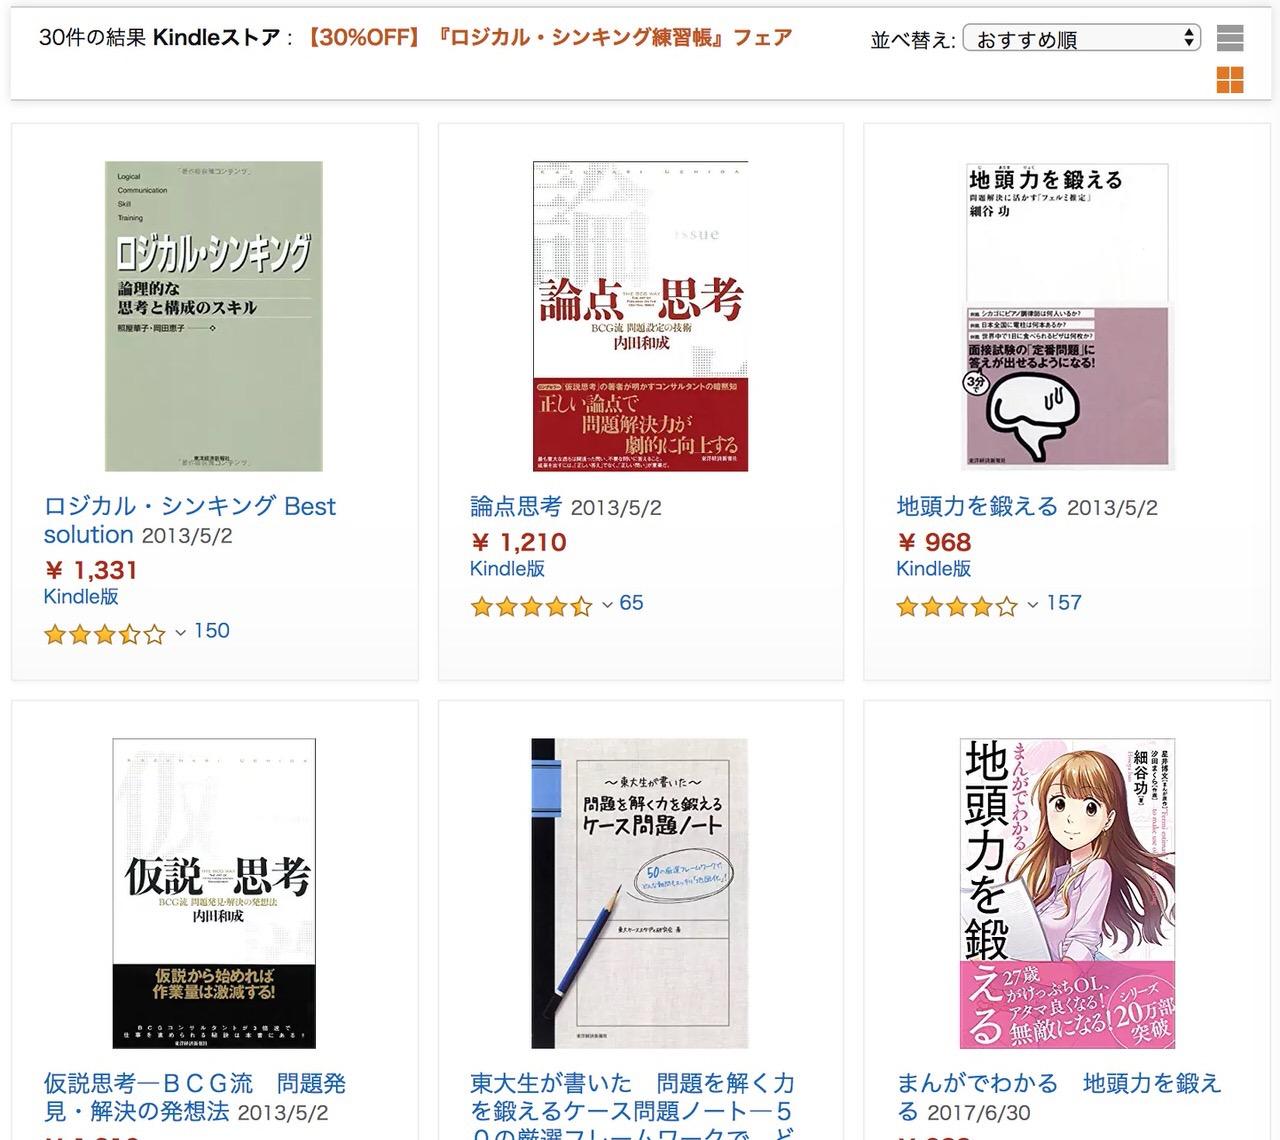 【Kindleセール】30%OFF「ロジカル・シンキング練習帳」フェア